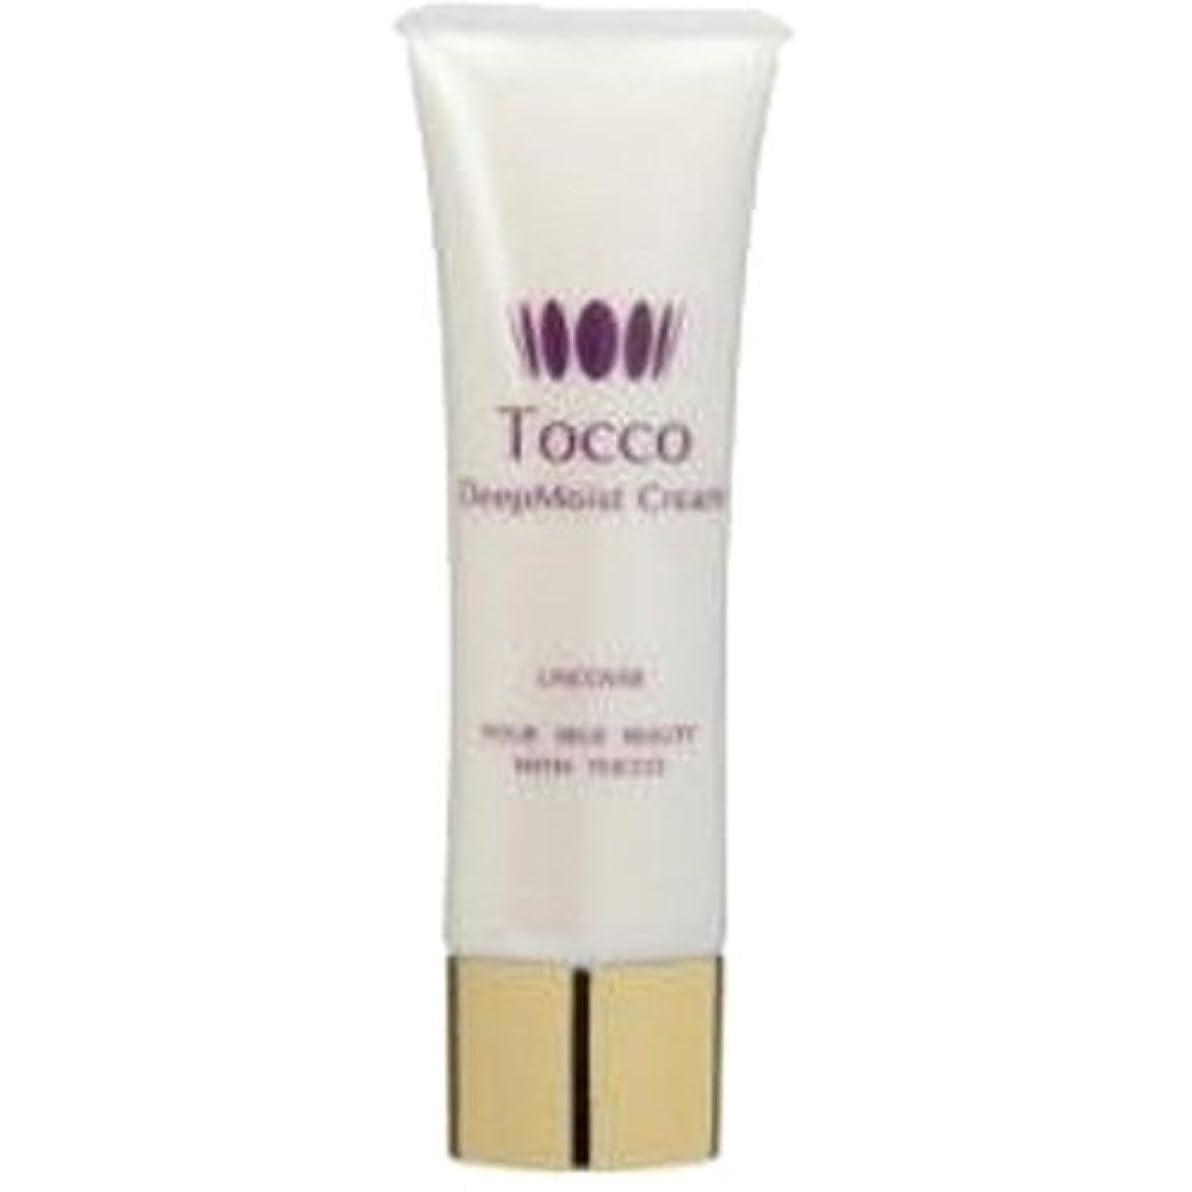 Tocco(トッコ)ディープモイストクリーム 30g